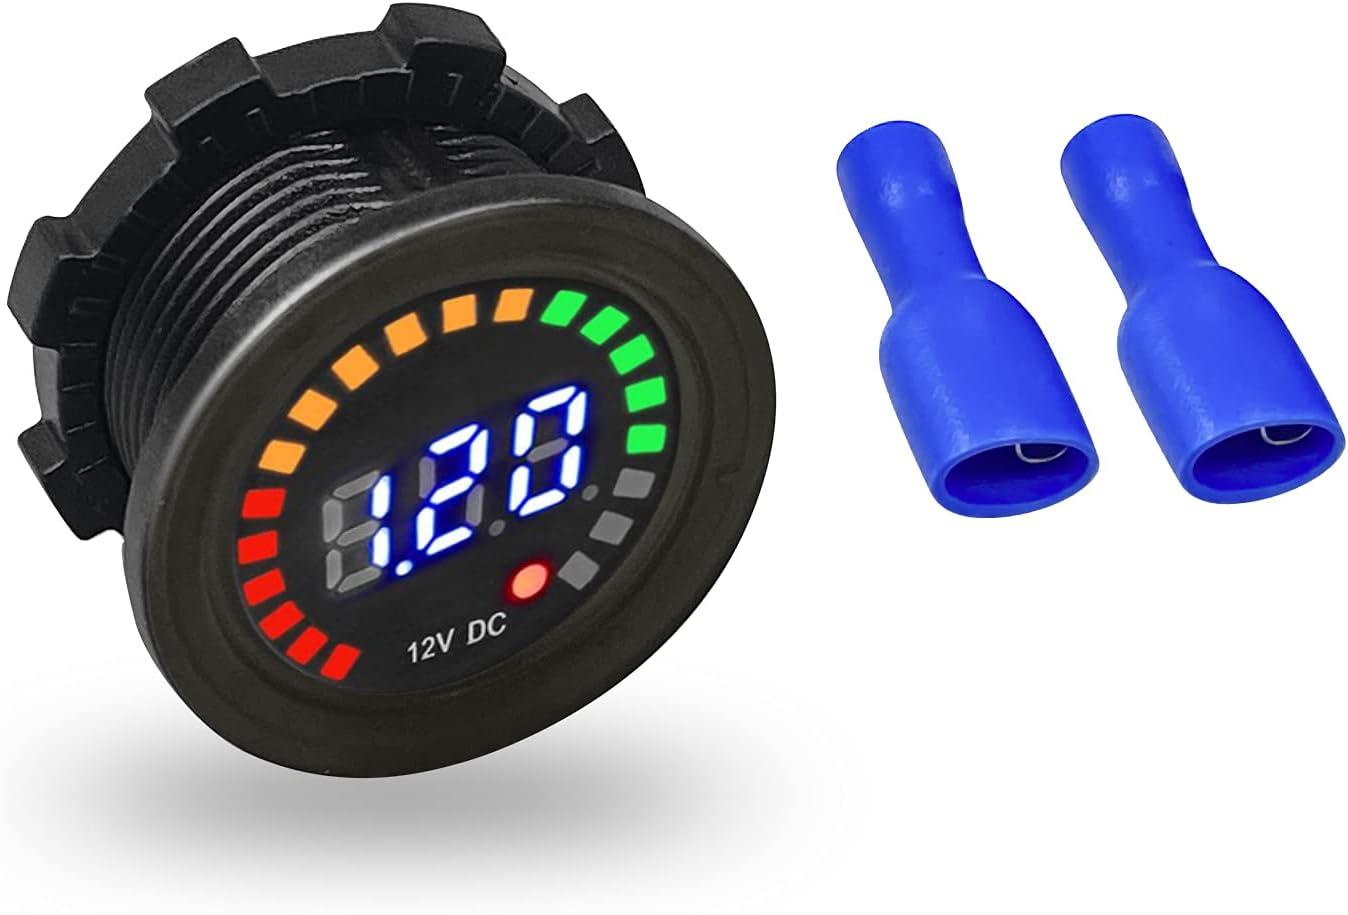 ZOETOOL Medidor de voltímetro 12vDC Color del Coche Pantalla Digital LED Voltímetro Medidor de Voltaje 12vDC Probador de batería para Coche Marino Motocicleta Camión Barco RV